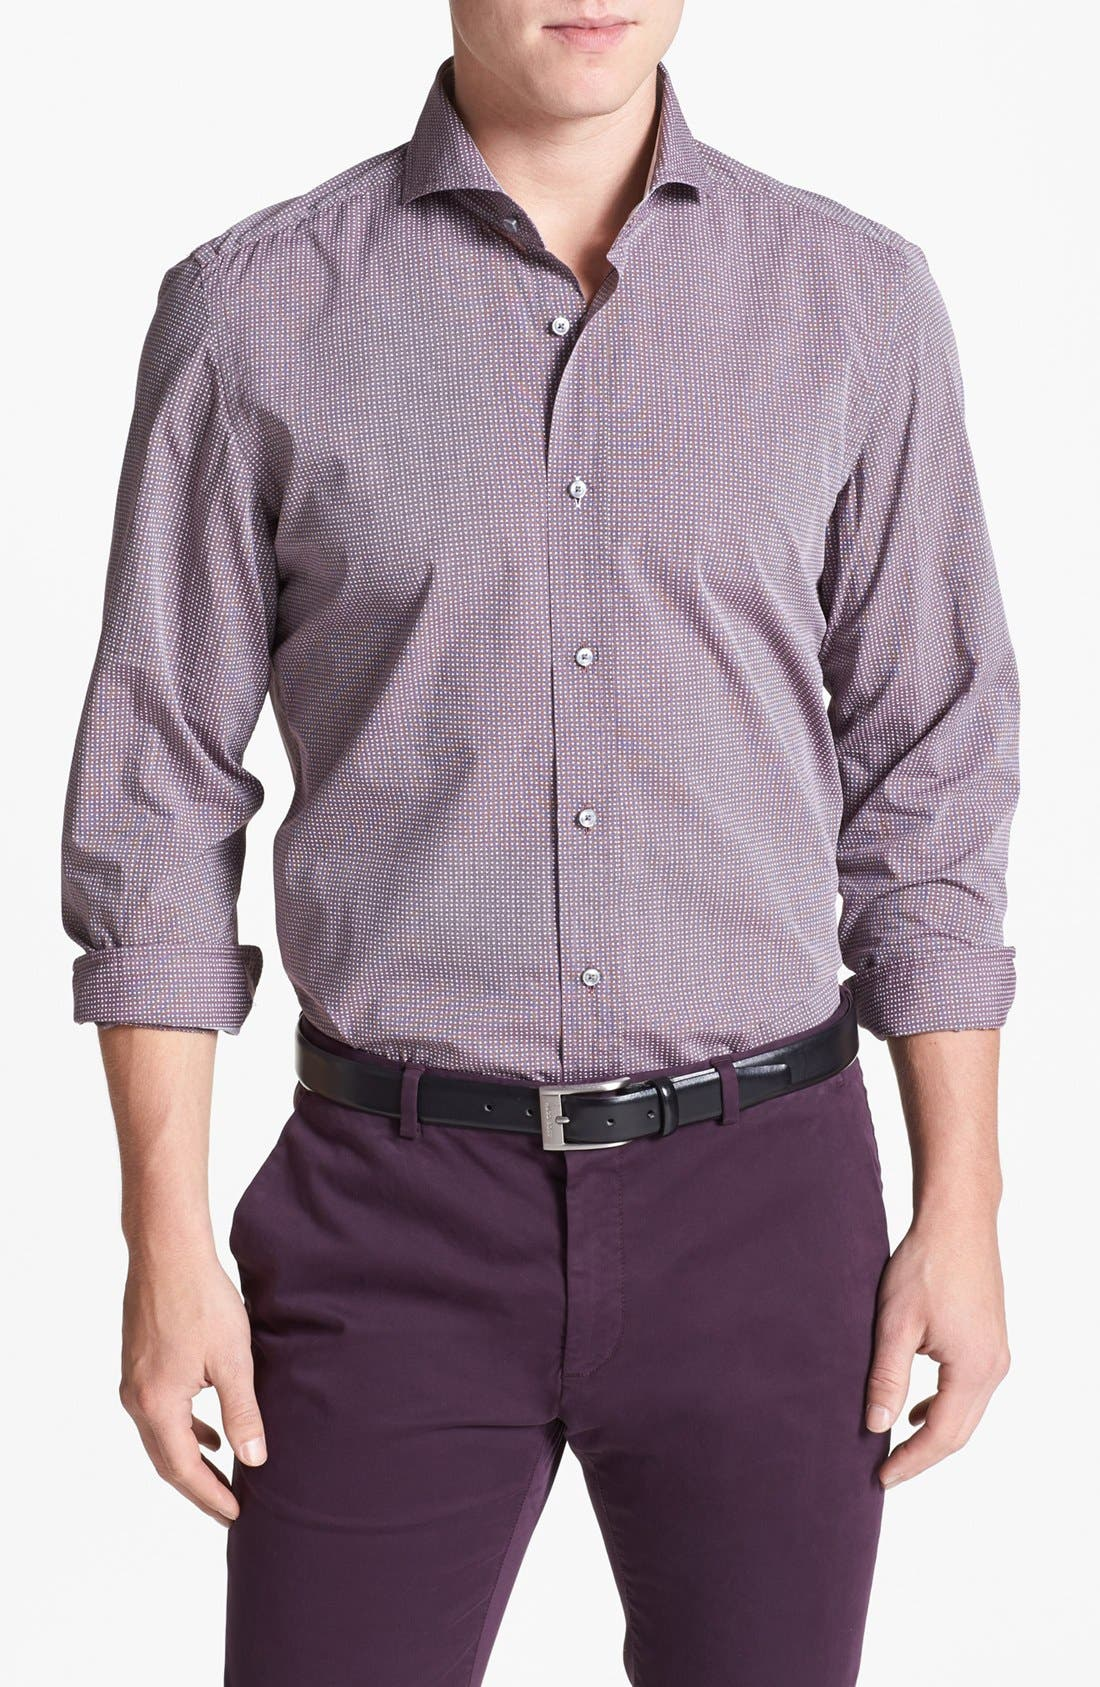 Alternate Image 1 Selected - BOSS HUGO BOSS 'Sean' Slim Fit Sport Shirt